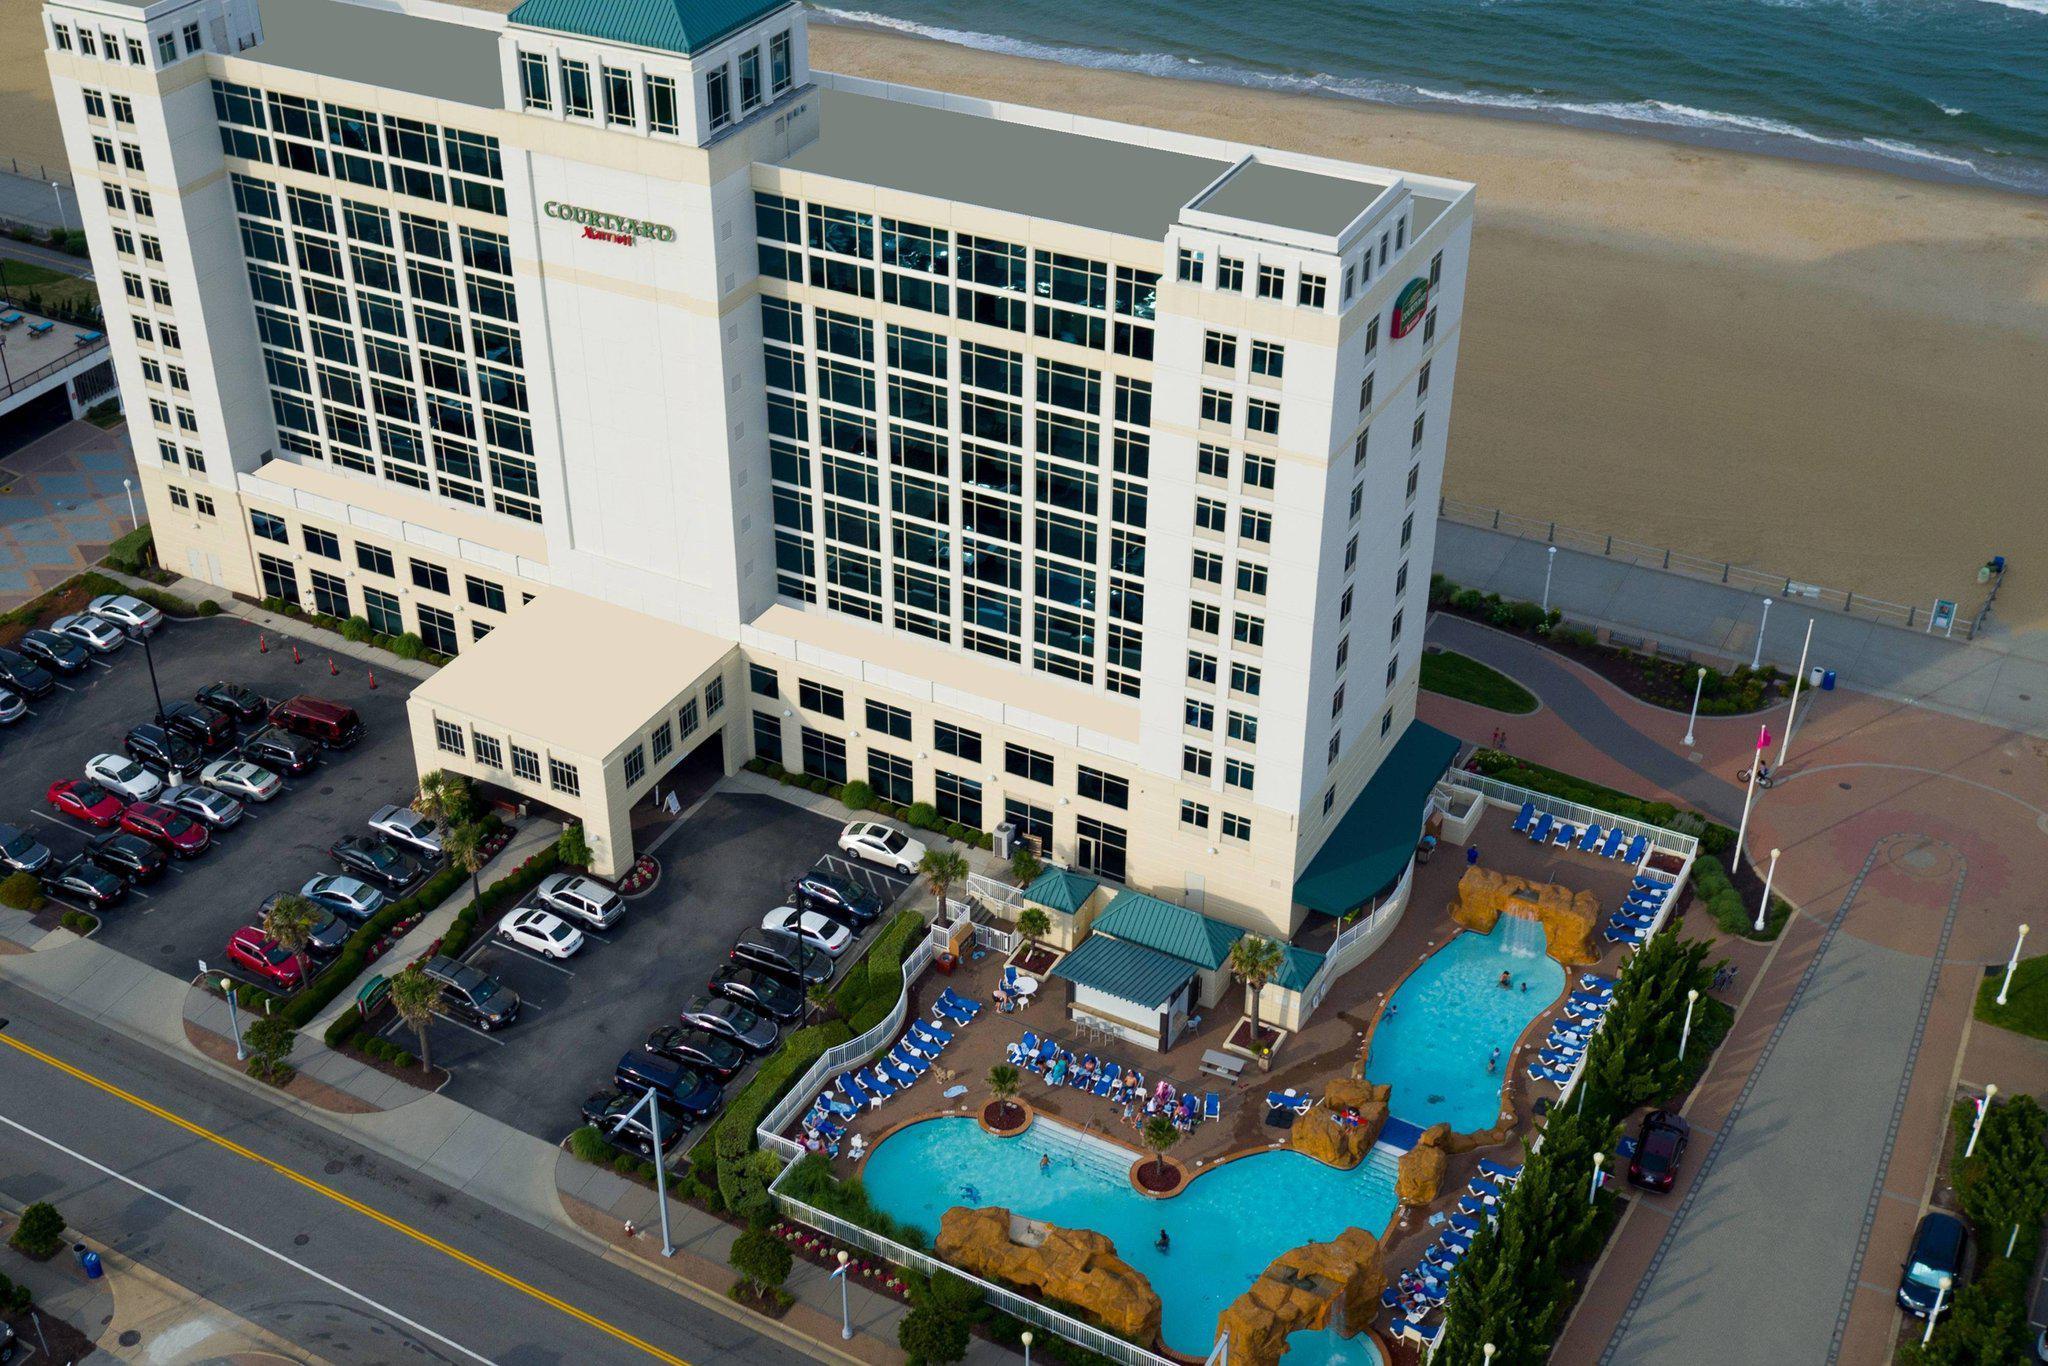 Courtyard by Marriott Virginia Beach Oceanfront/North 37th Street